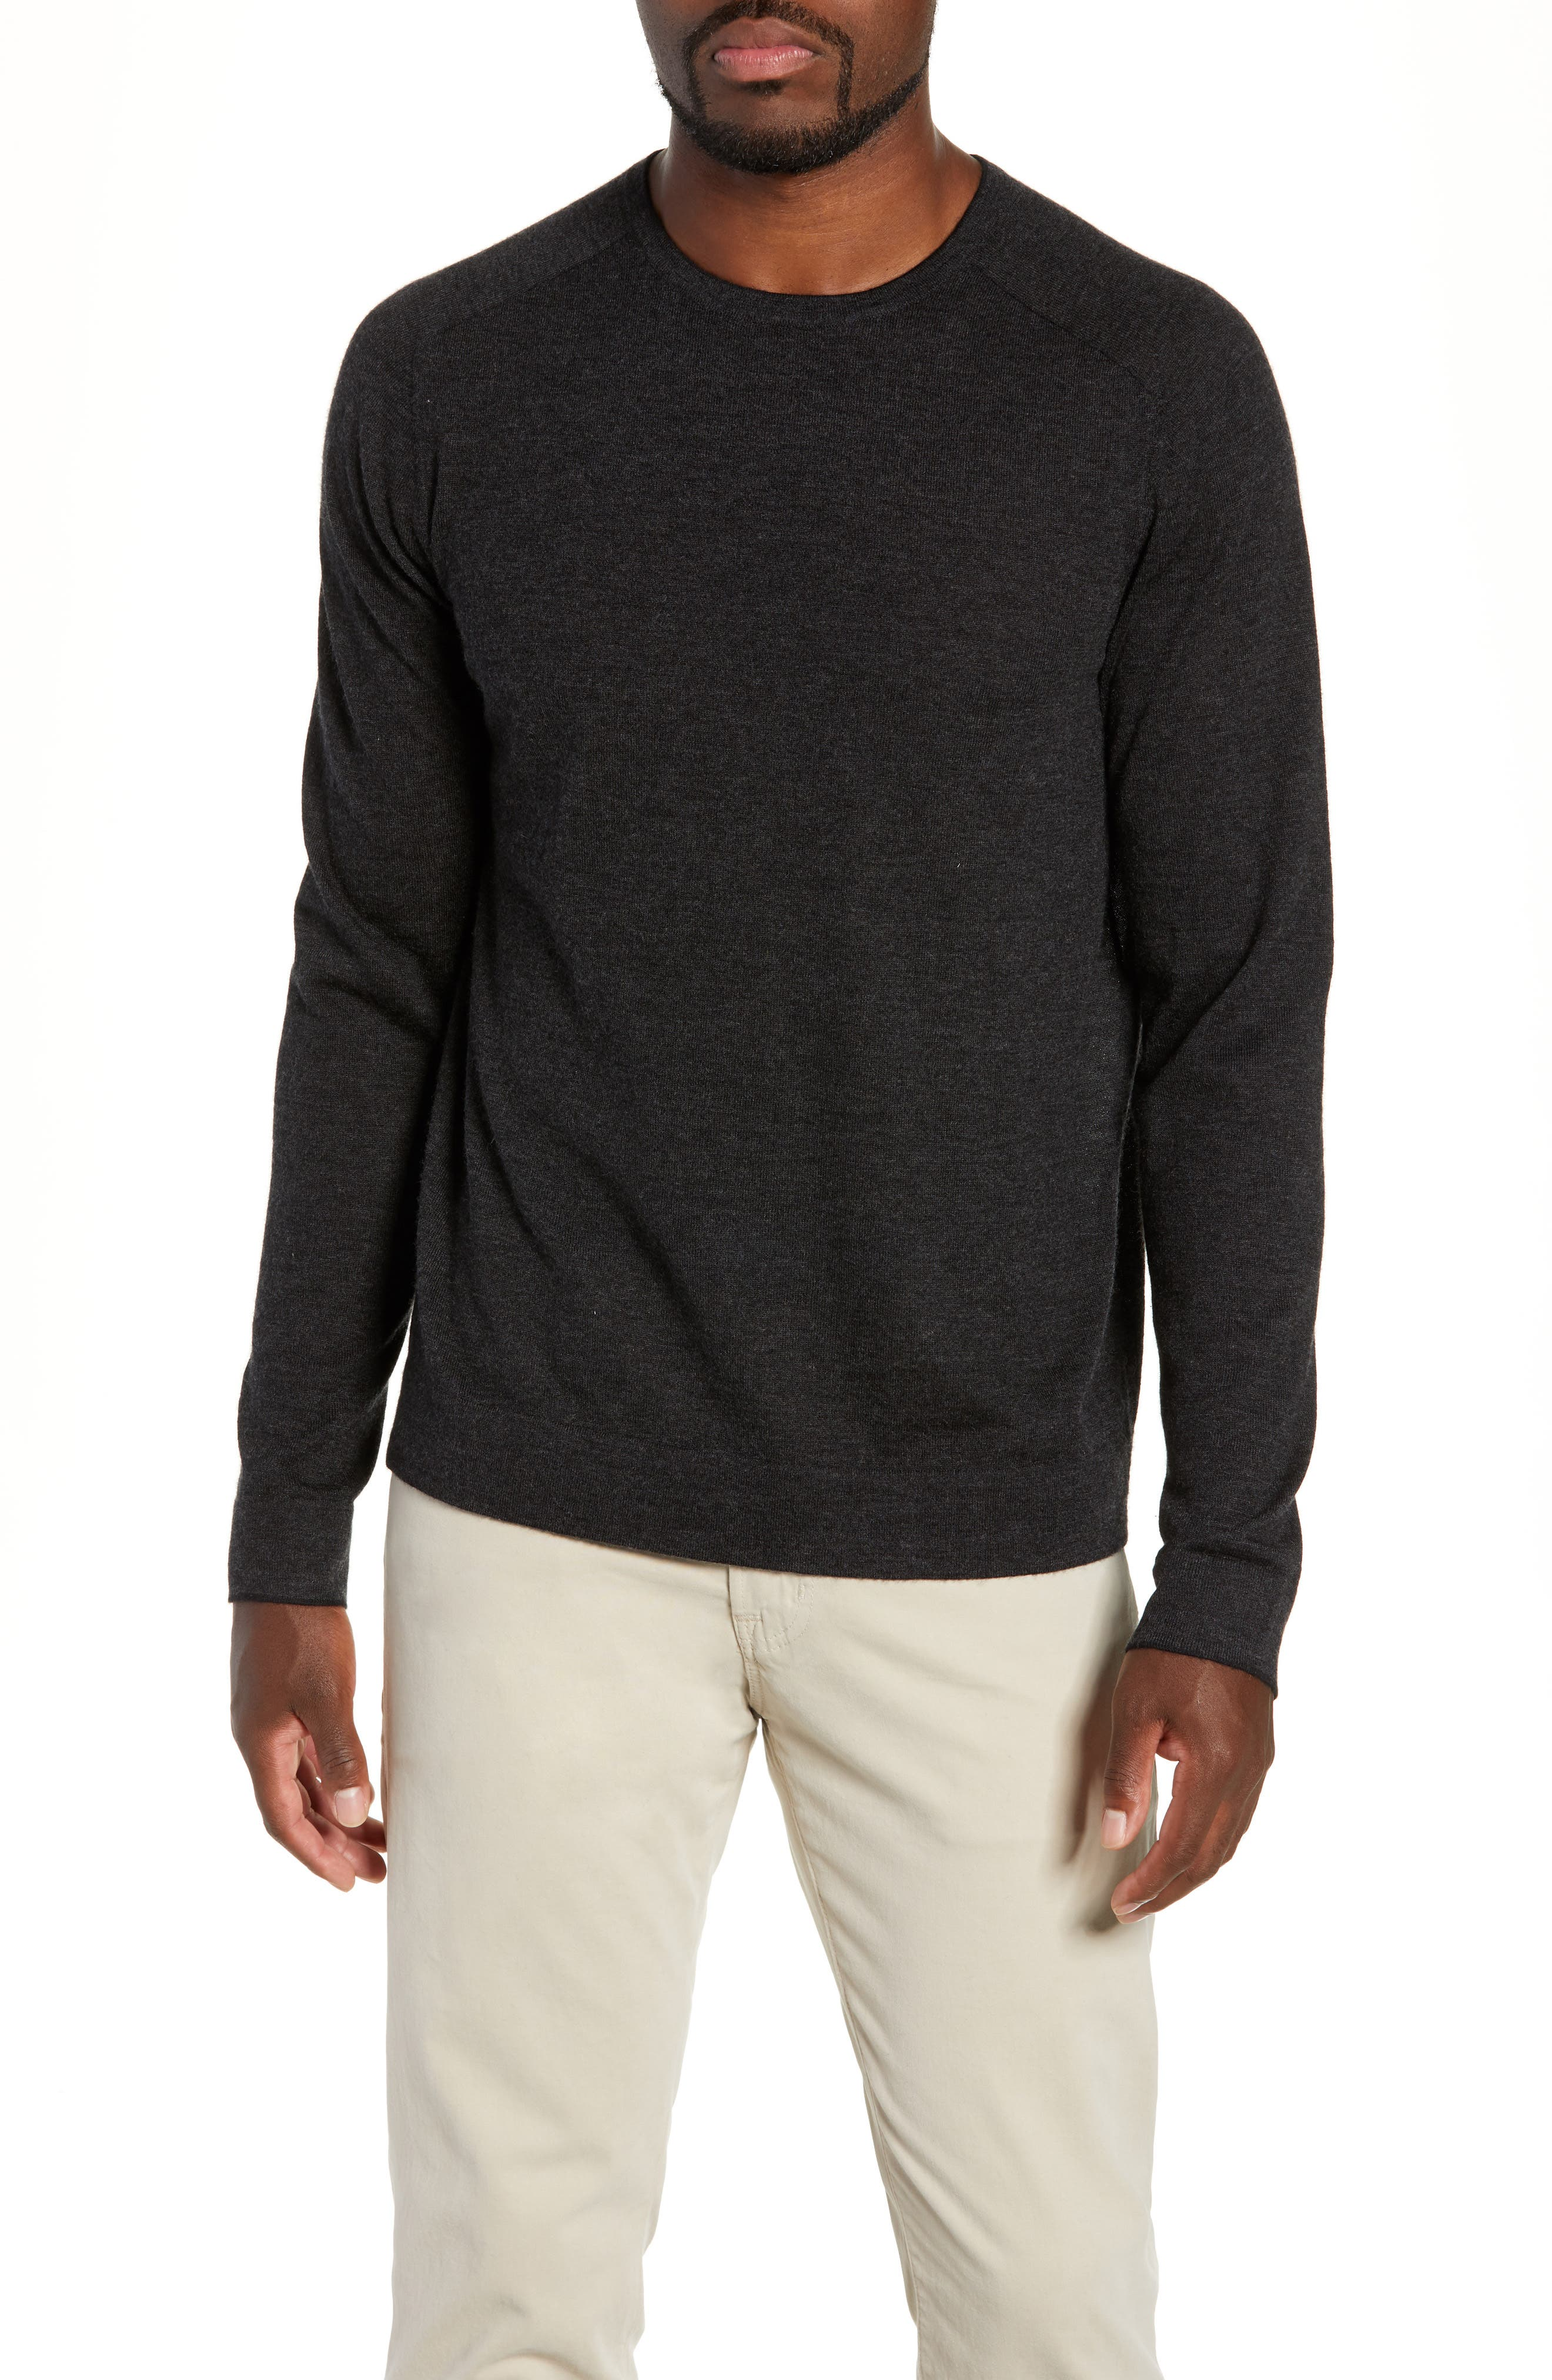 NORDSTROM SIGNATURE,                             Cashmere Crewneck Sweater,                             Main thumbnail 1, color,                             030